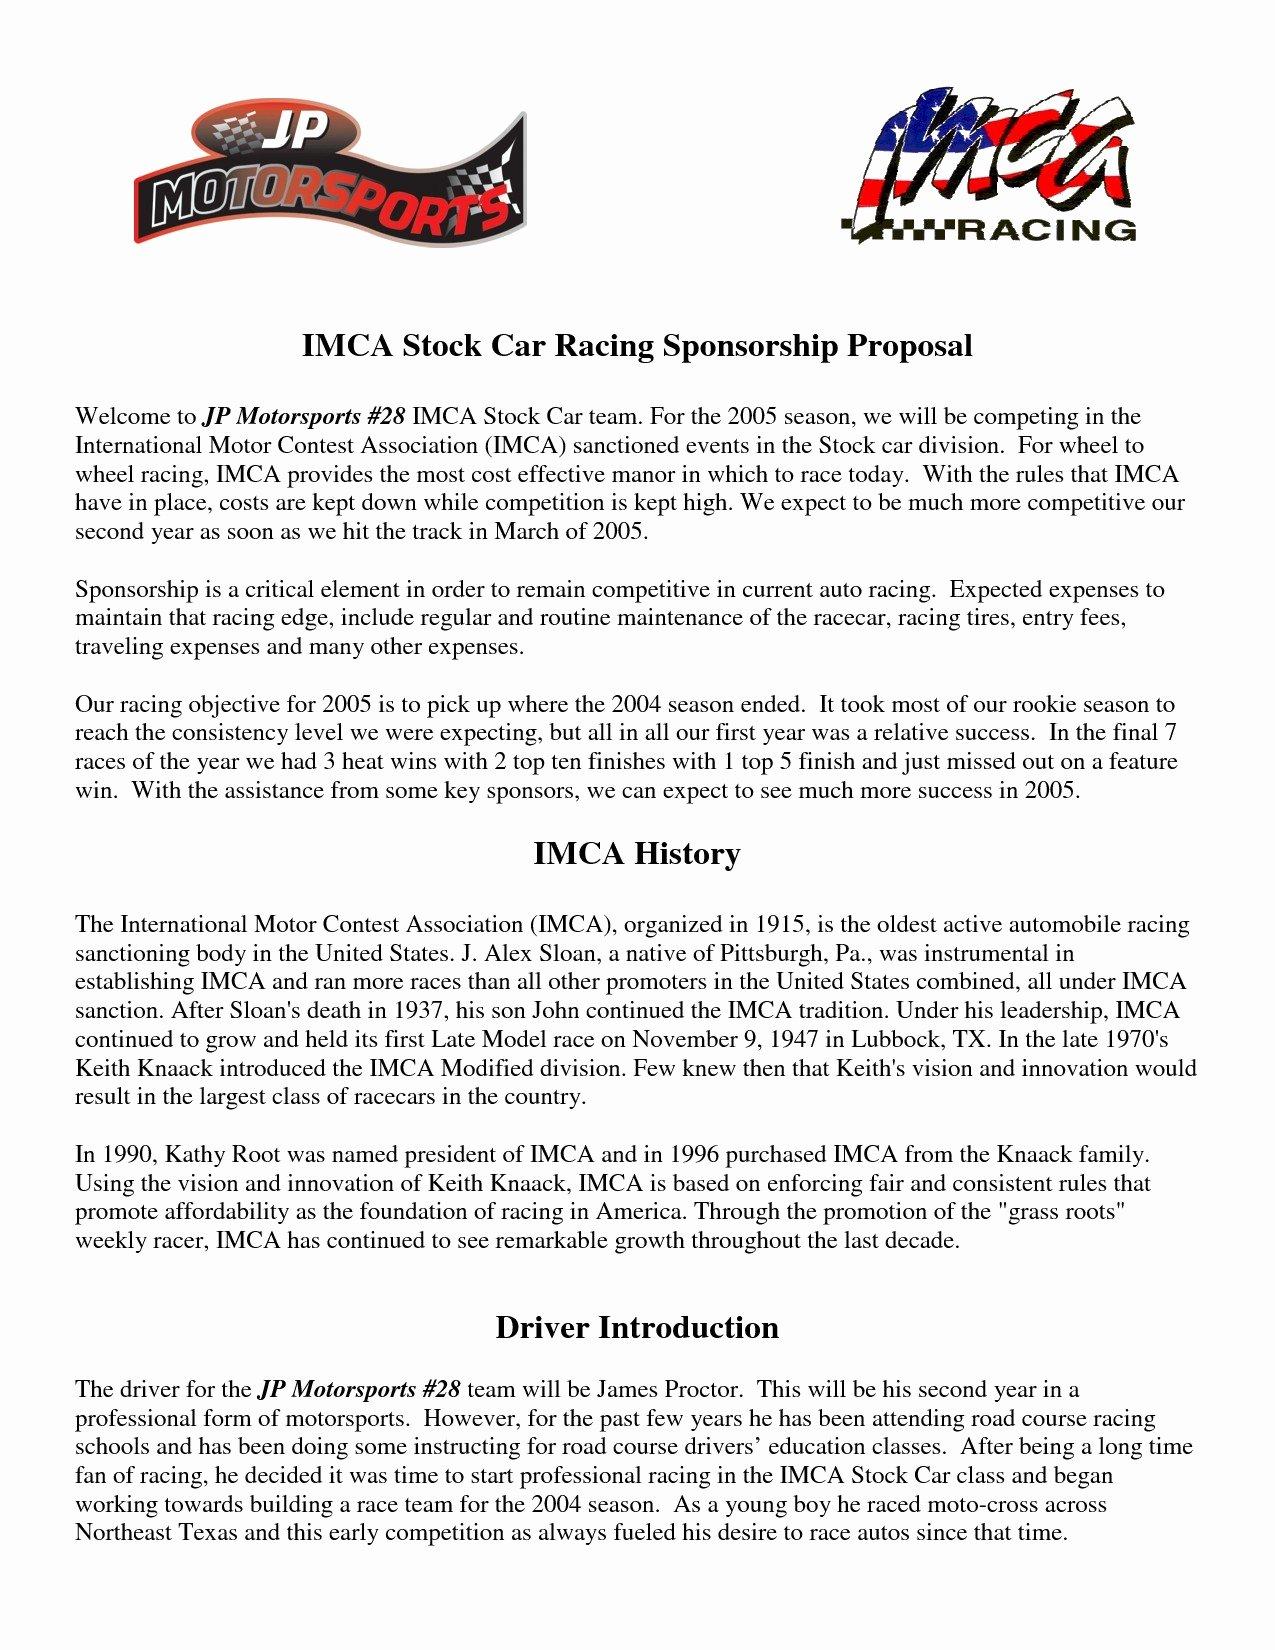 Sponsorship Proposal Template Free Fresh Sponsorship Proposal Letter Template Collection